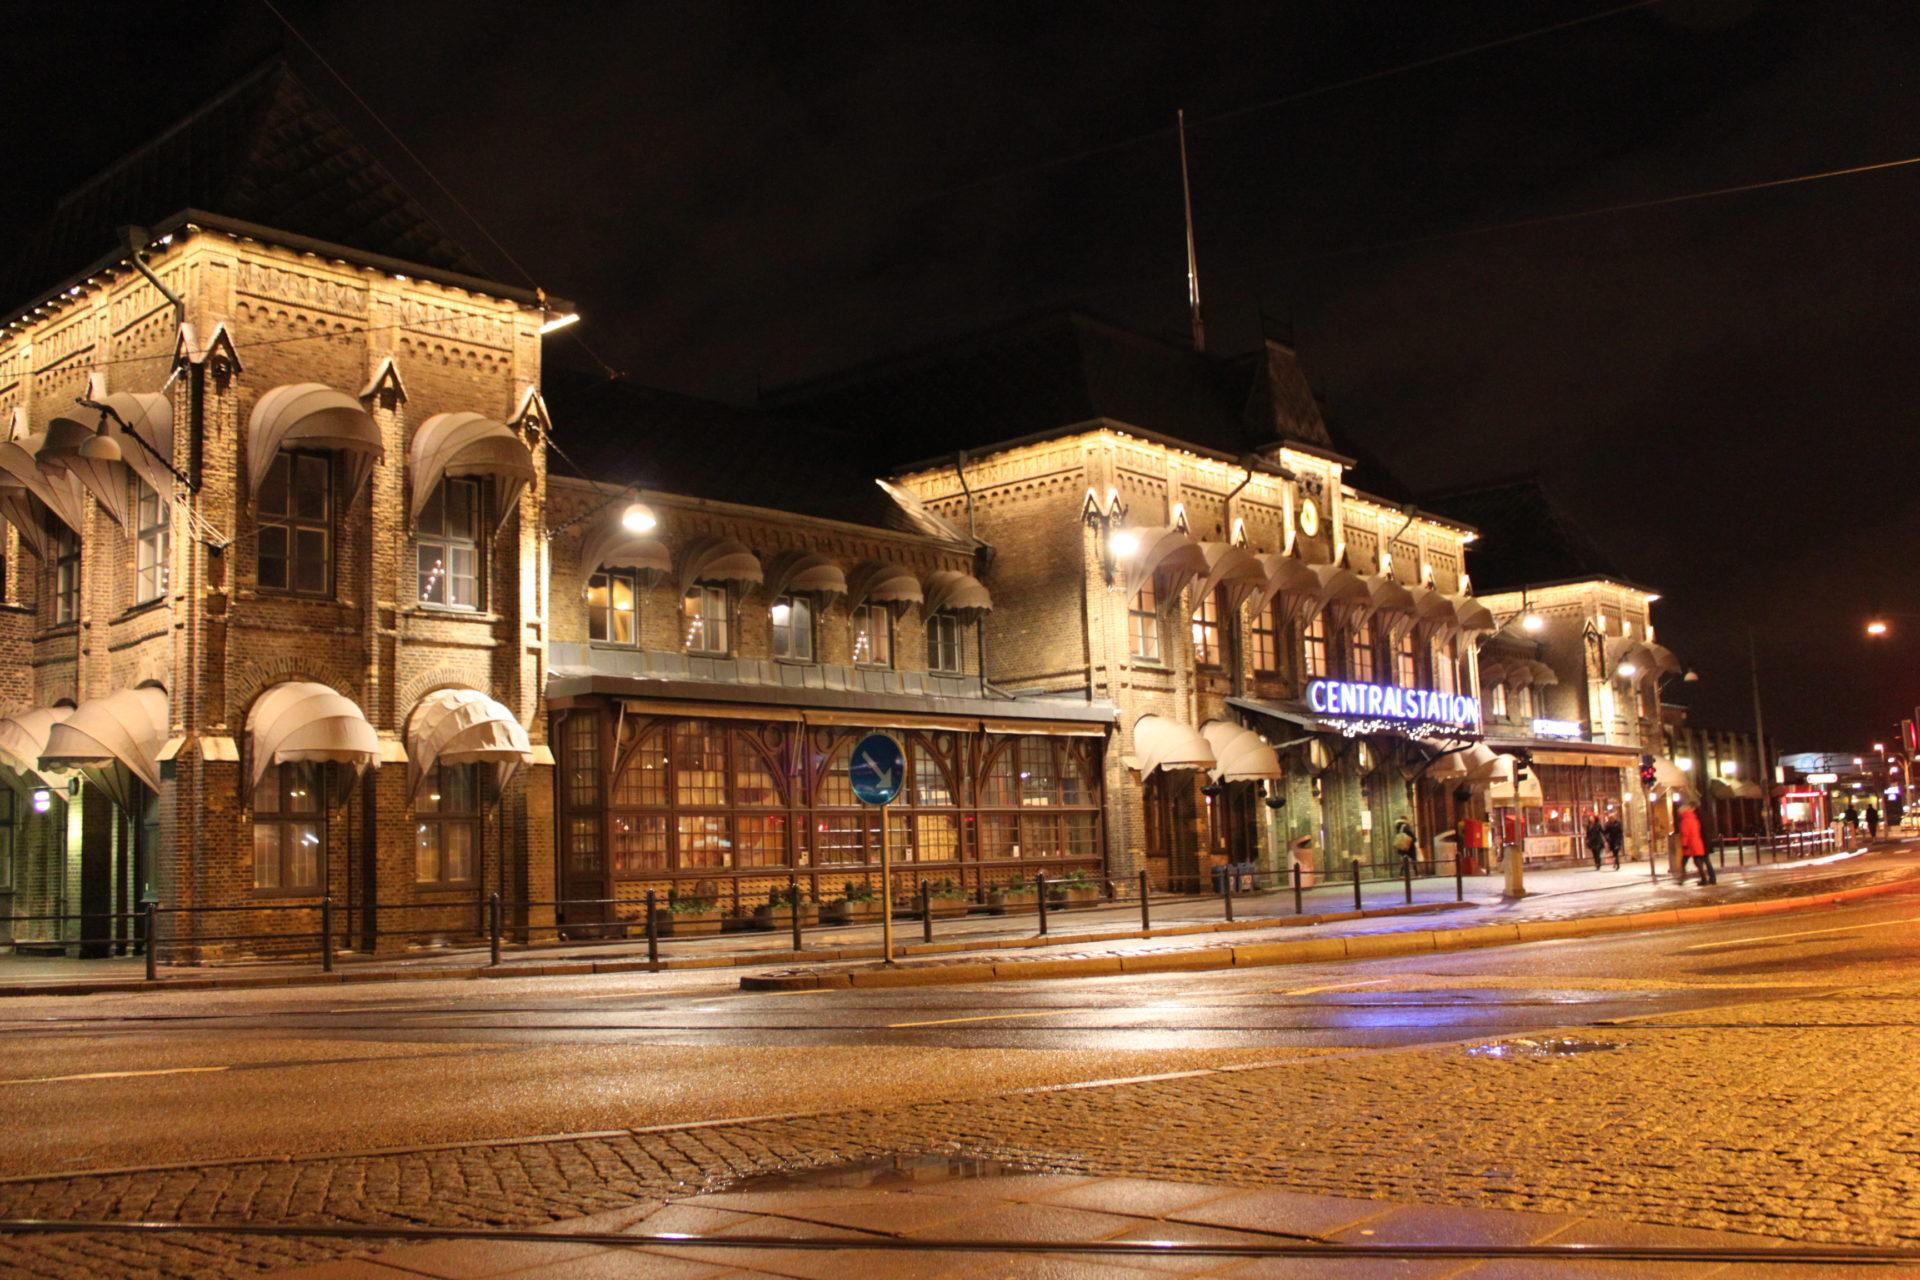 """Central Station"" photo by Ferenec Nasztanovics"